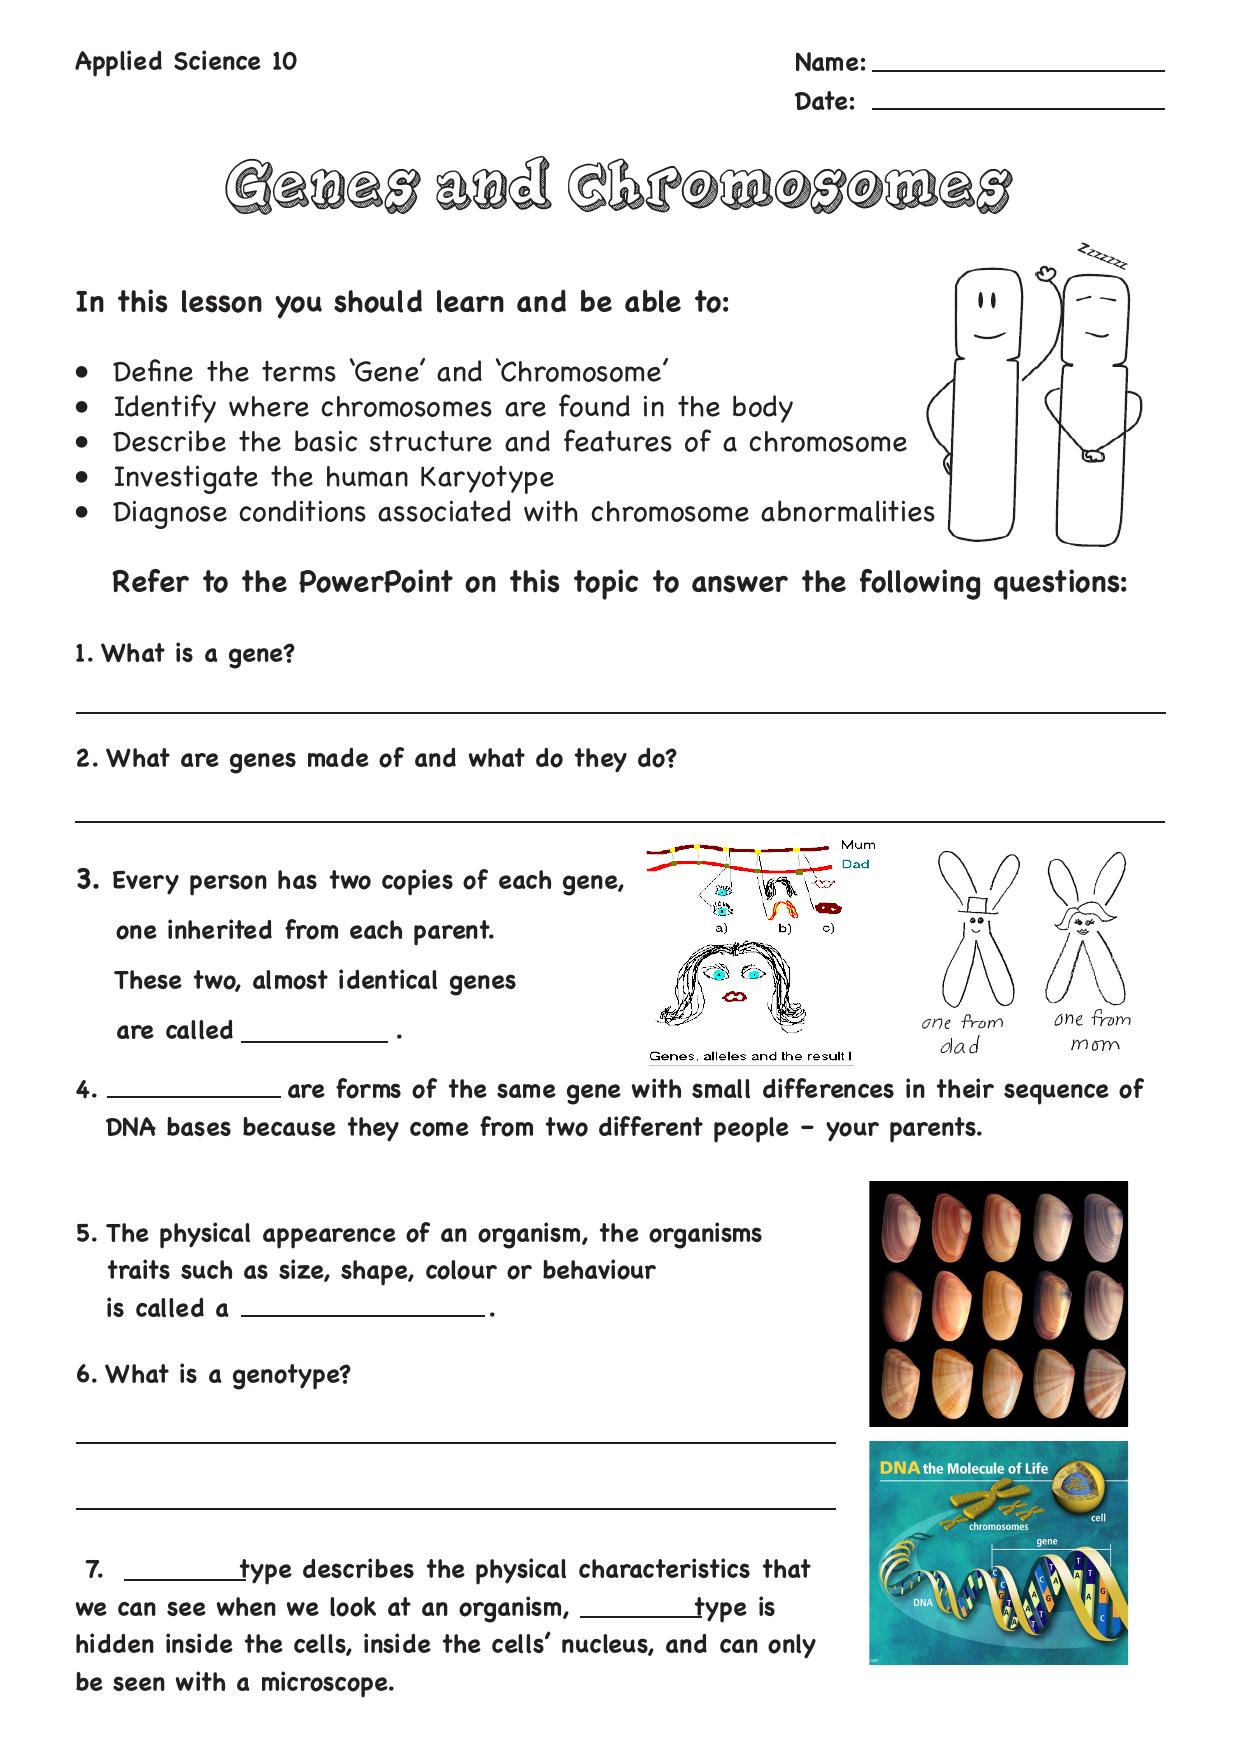 Genes And Chromosomes Worksheet Answers - Nidecmege